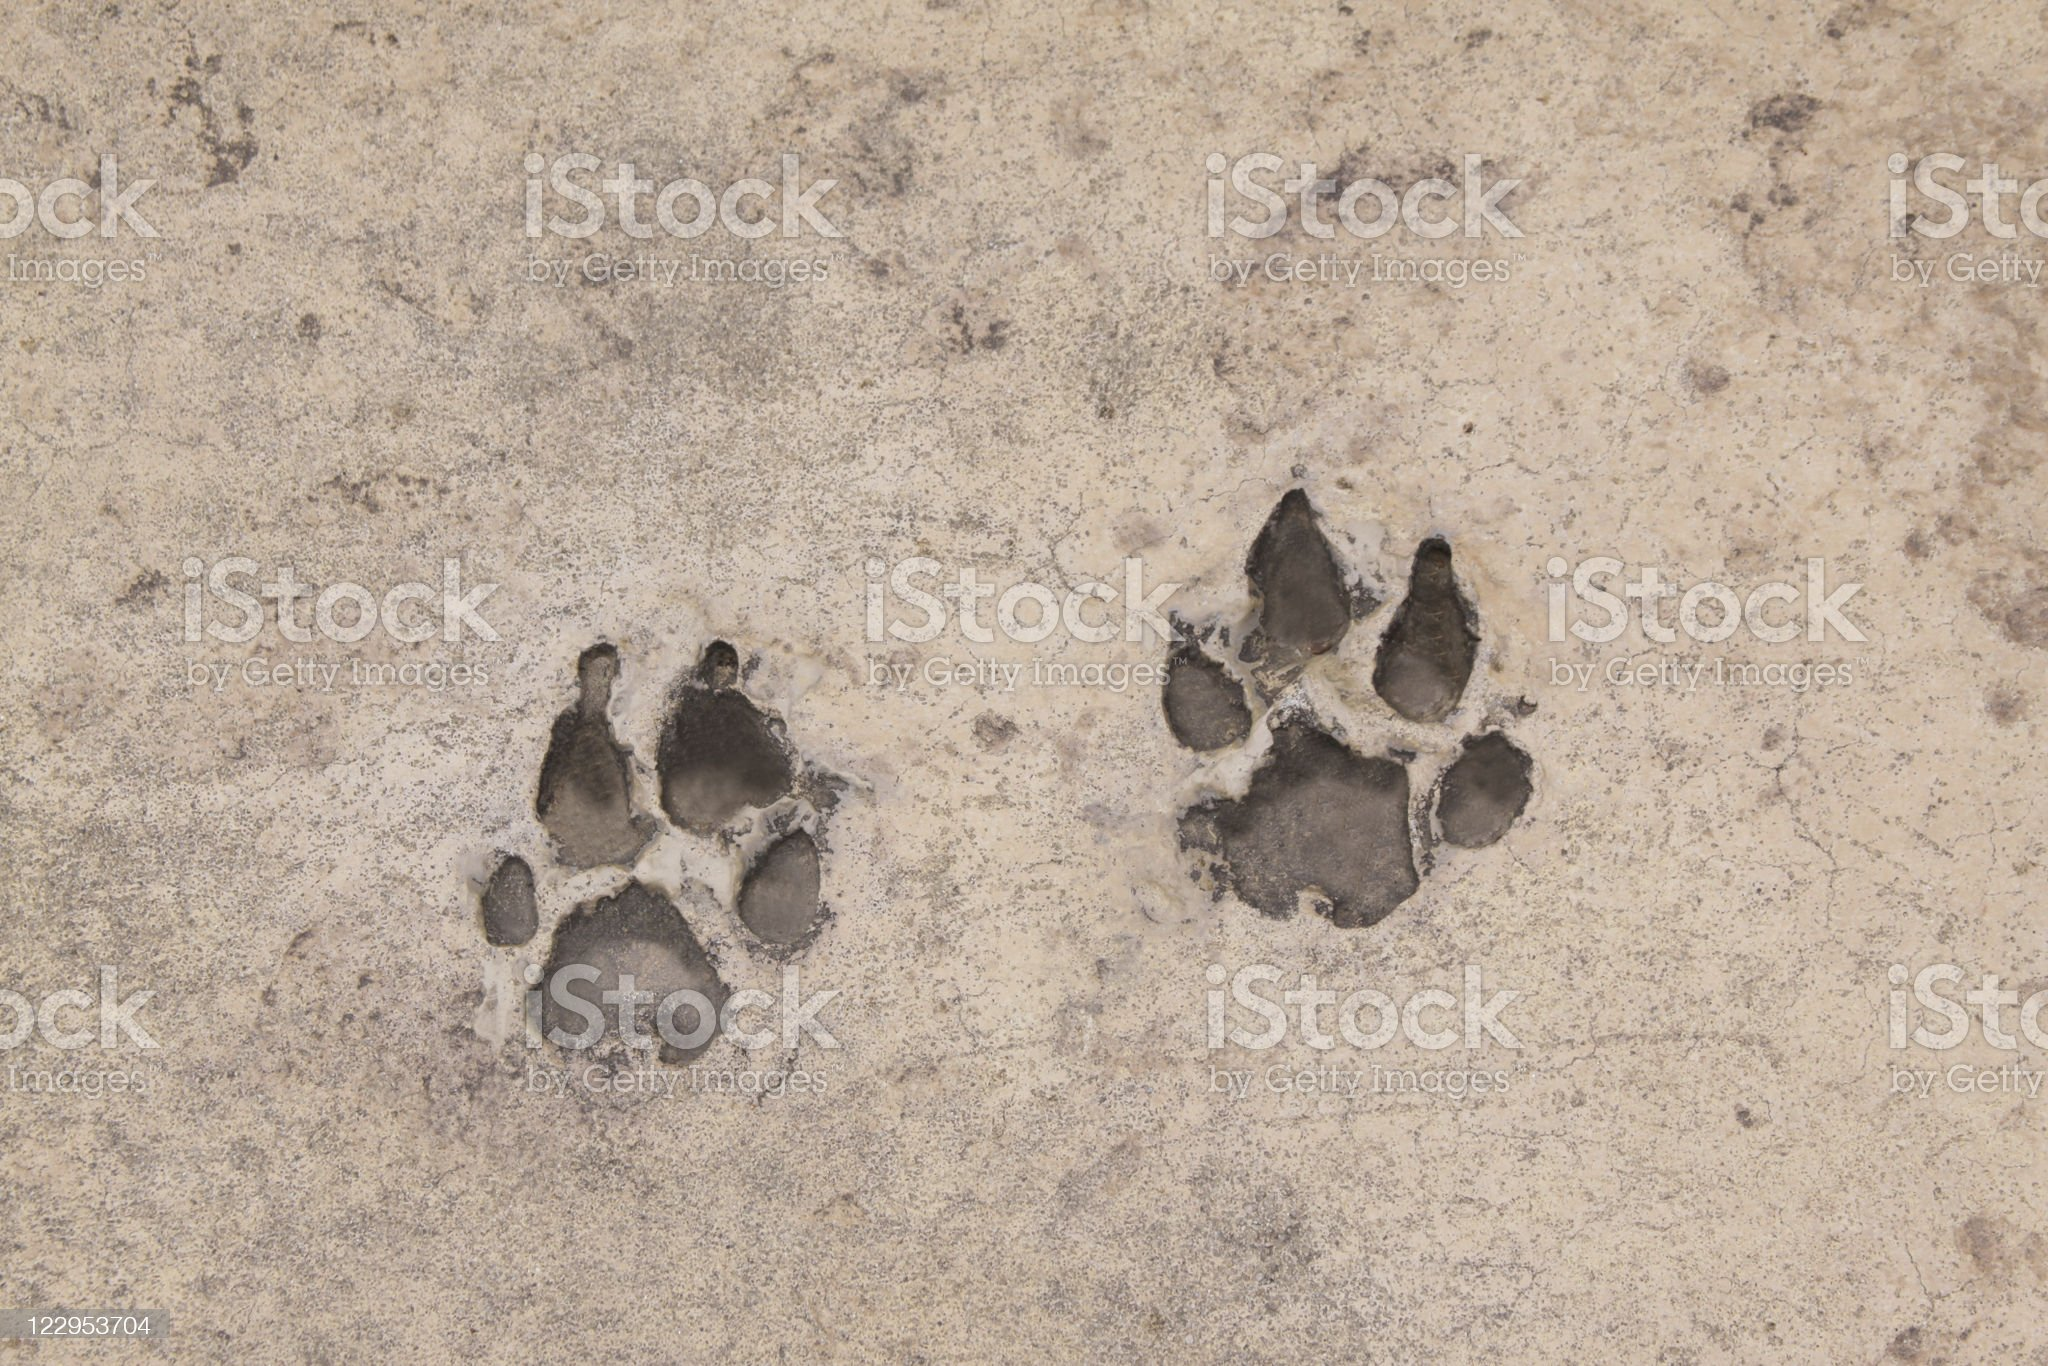 Pawprints in Concrete royalty-free stock photo